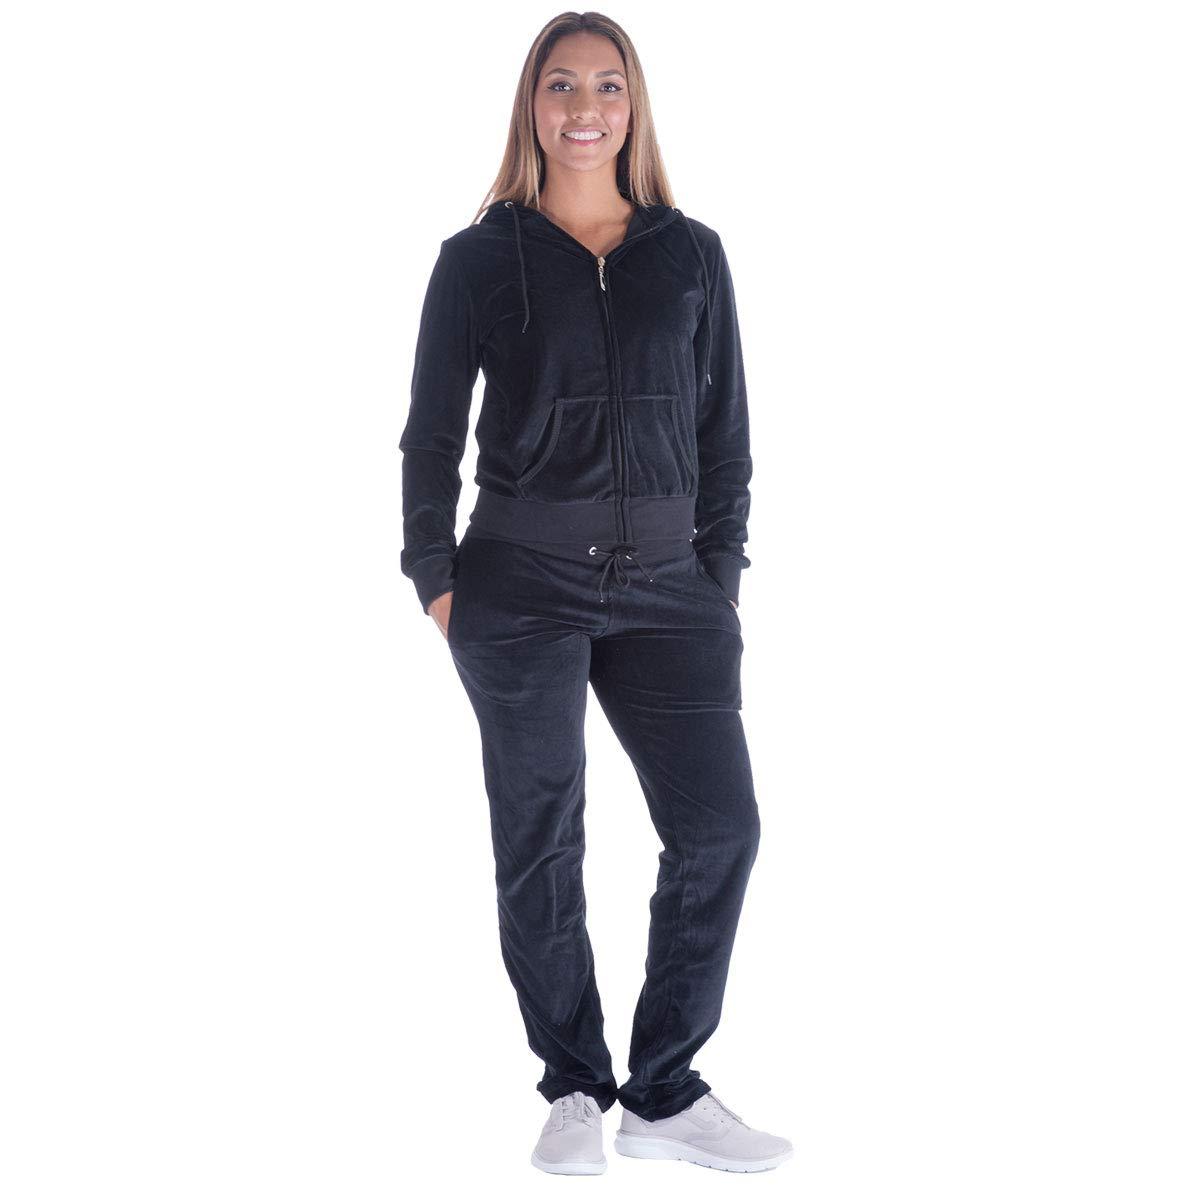 Black Grey Womens Velvet Zip Hooded Sweatshirt Athletic Soft Plus Size Hooded and Sweat Pants Tracksuit Set (XL, Black)